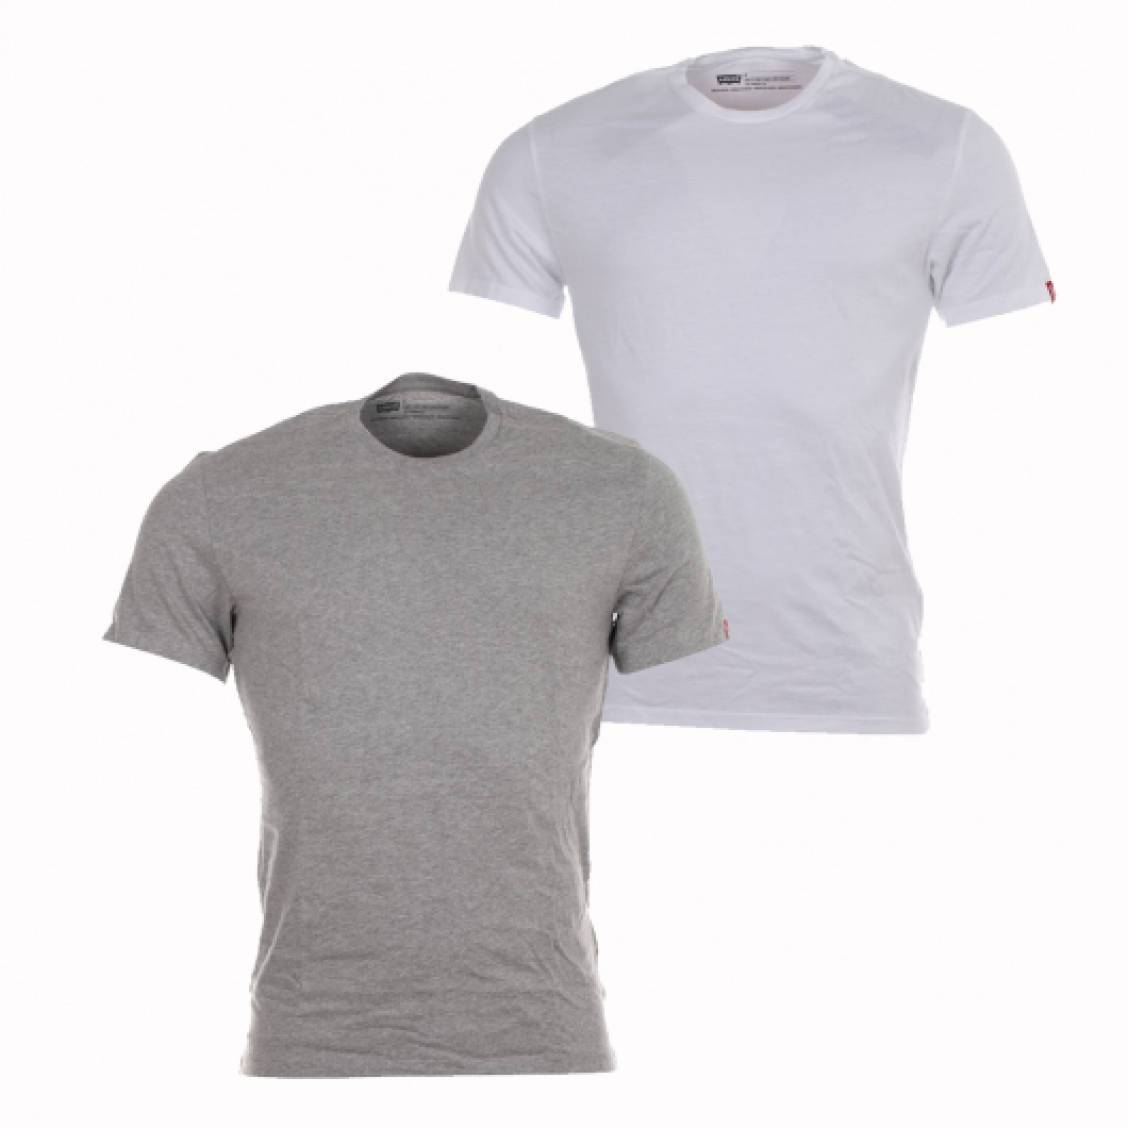 lot de 2 tee shirts levi 39 s slim fit crewneck en coton gris. Black Bedroom Furniture Sets. Home Design Ideas